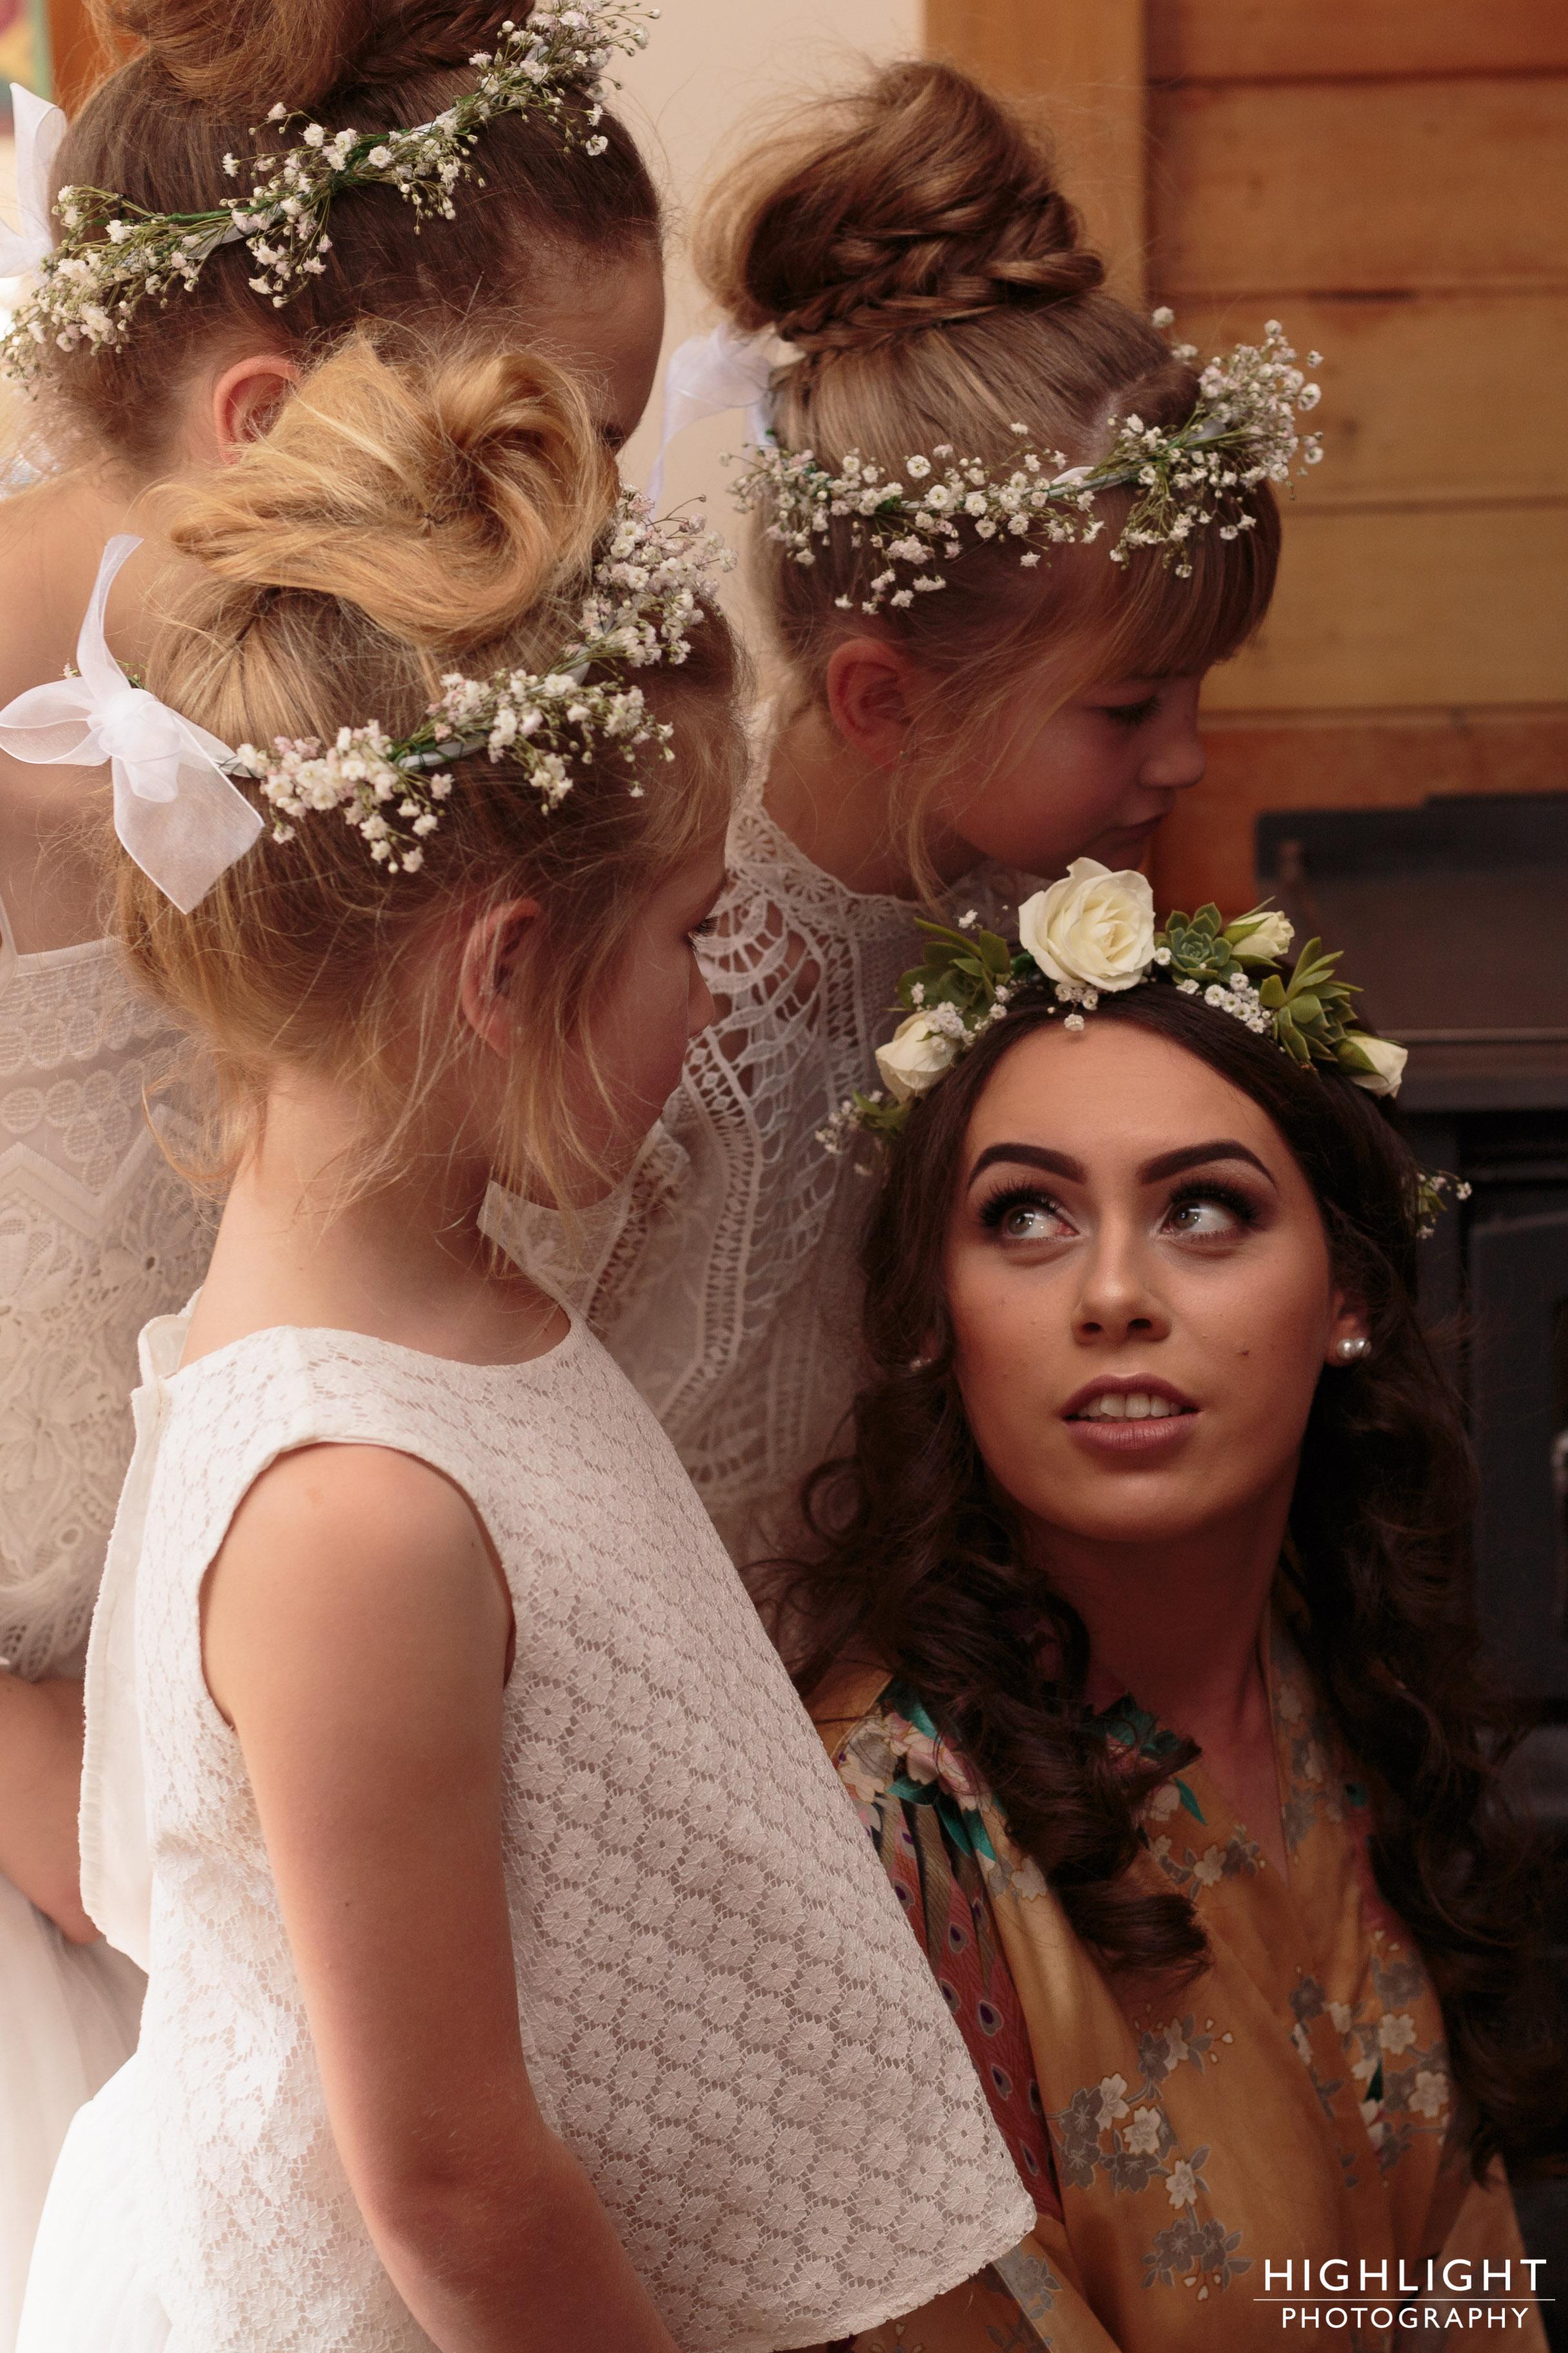 highlight_wedding_photography_makoura_lodge_manawatu_new_zealand-37.jpg